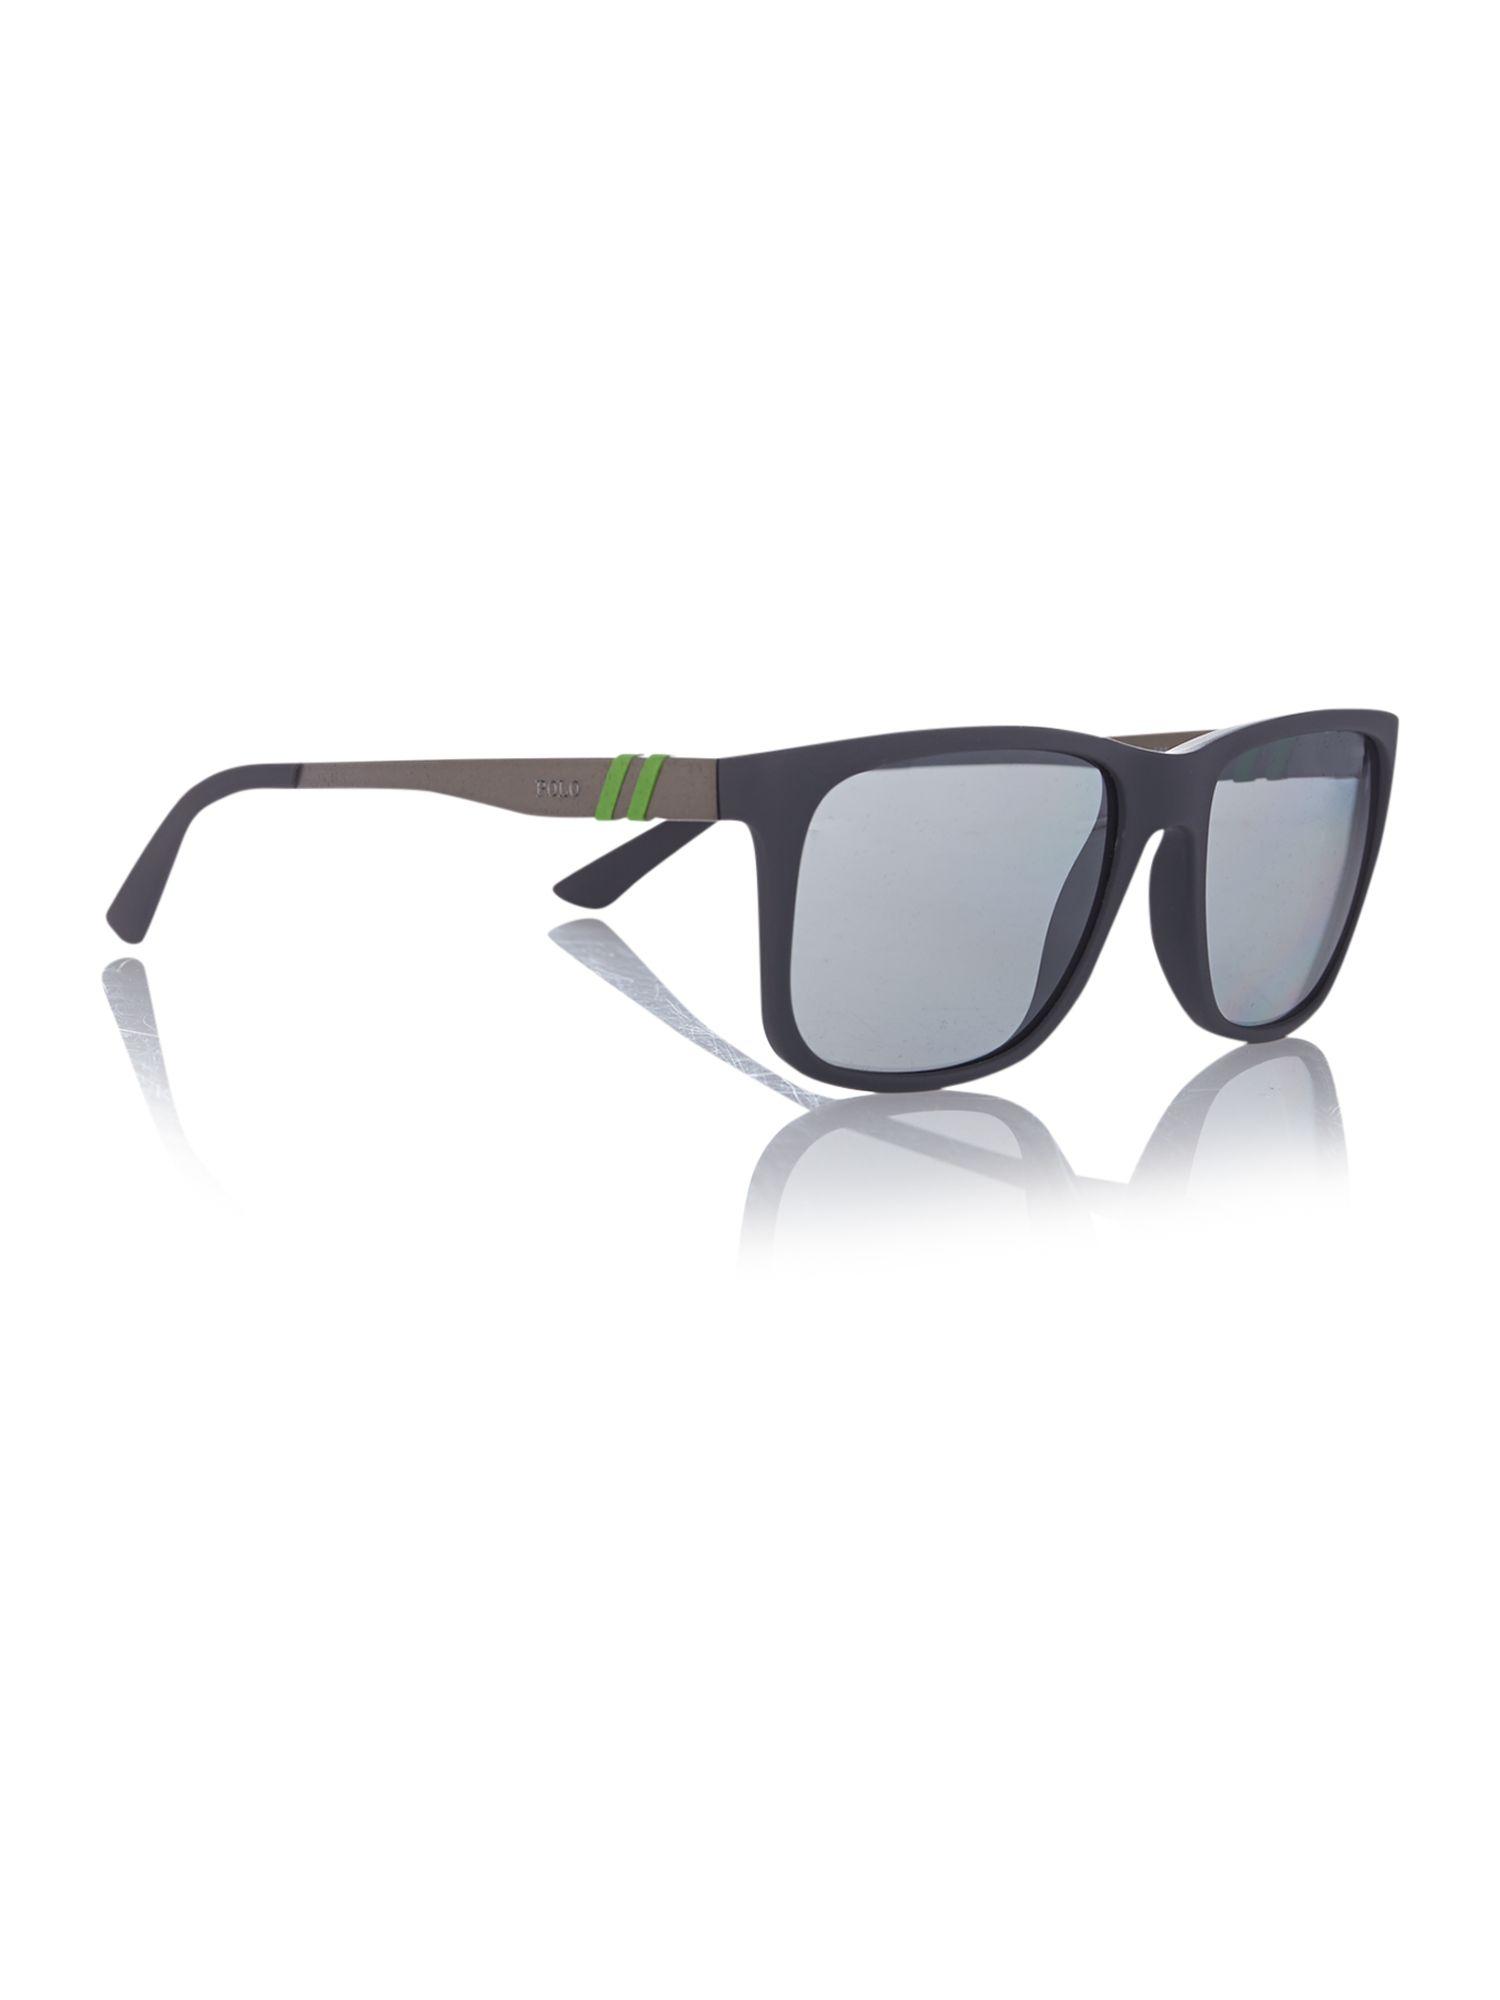 Prada Cat Eye Sunglasses in Black Lyst